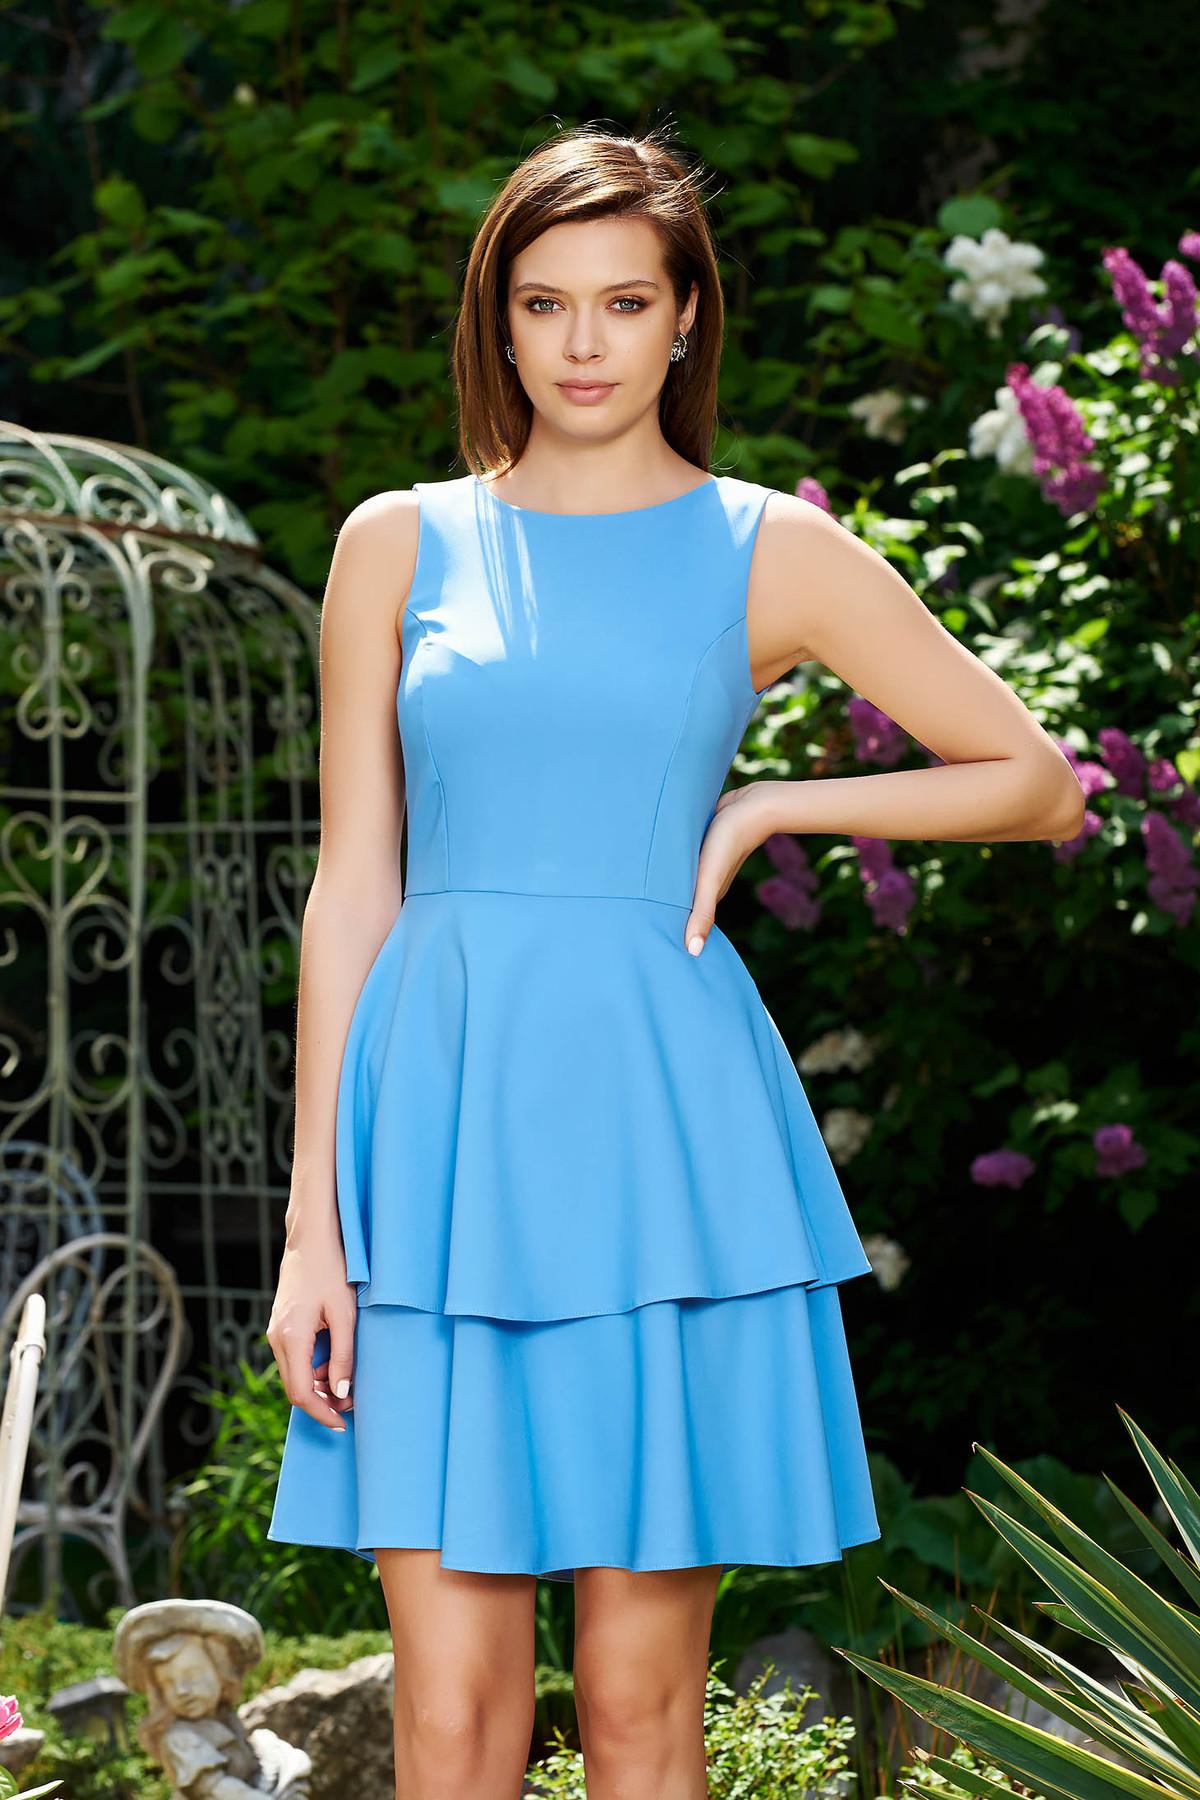 Rochie StarShinerS albastra eleganta in clos din stofa usor elastica cu volanase